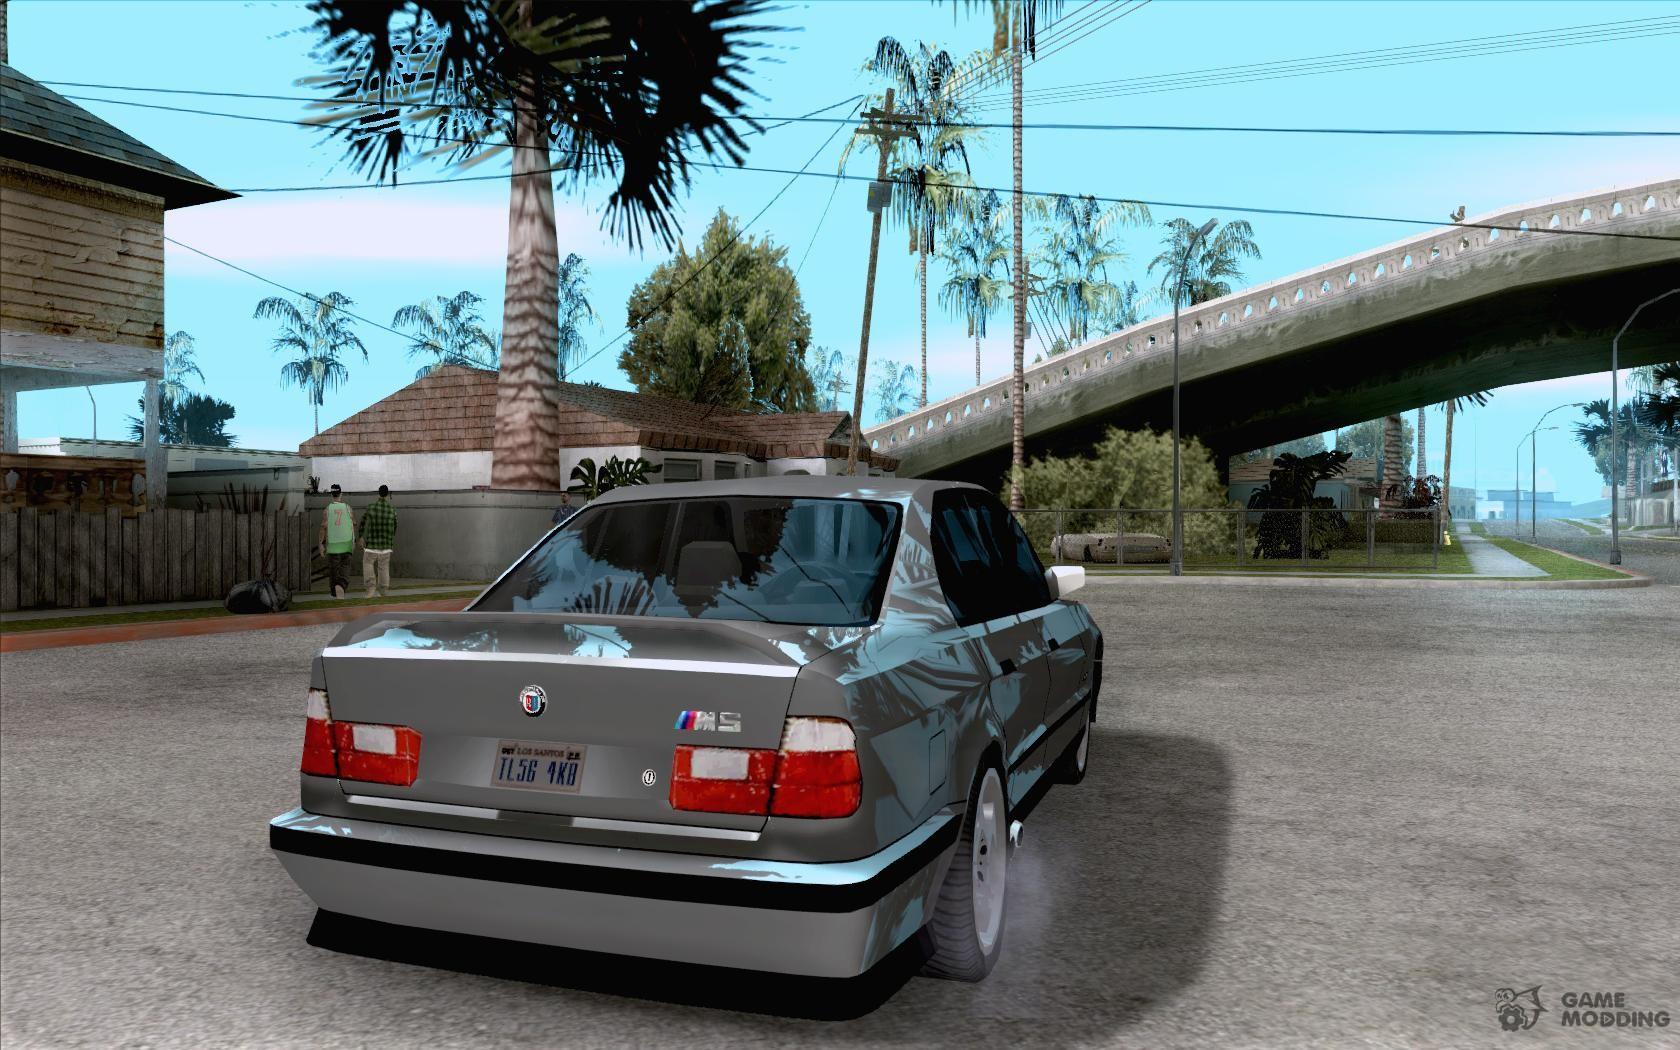 BMW M E For GTA San Andreas - 1990 bmw m5